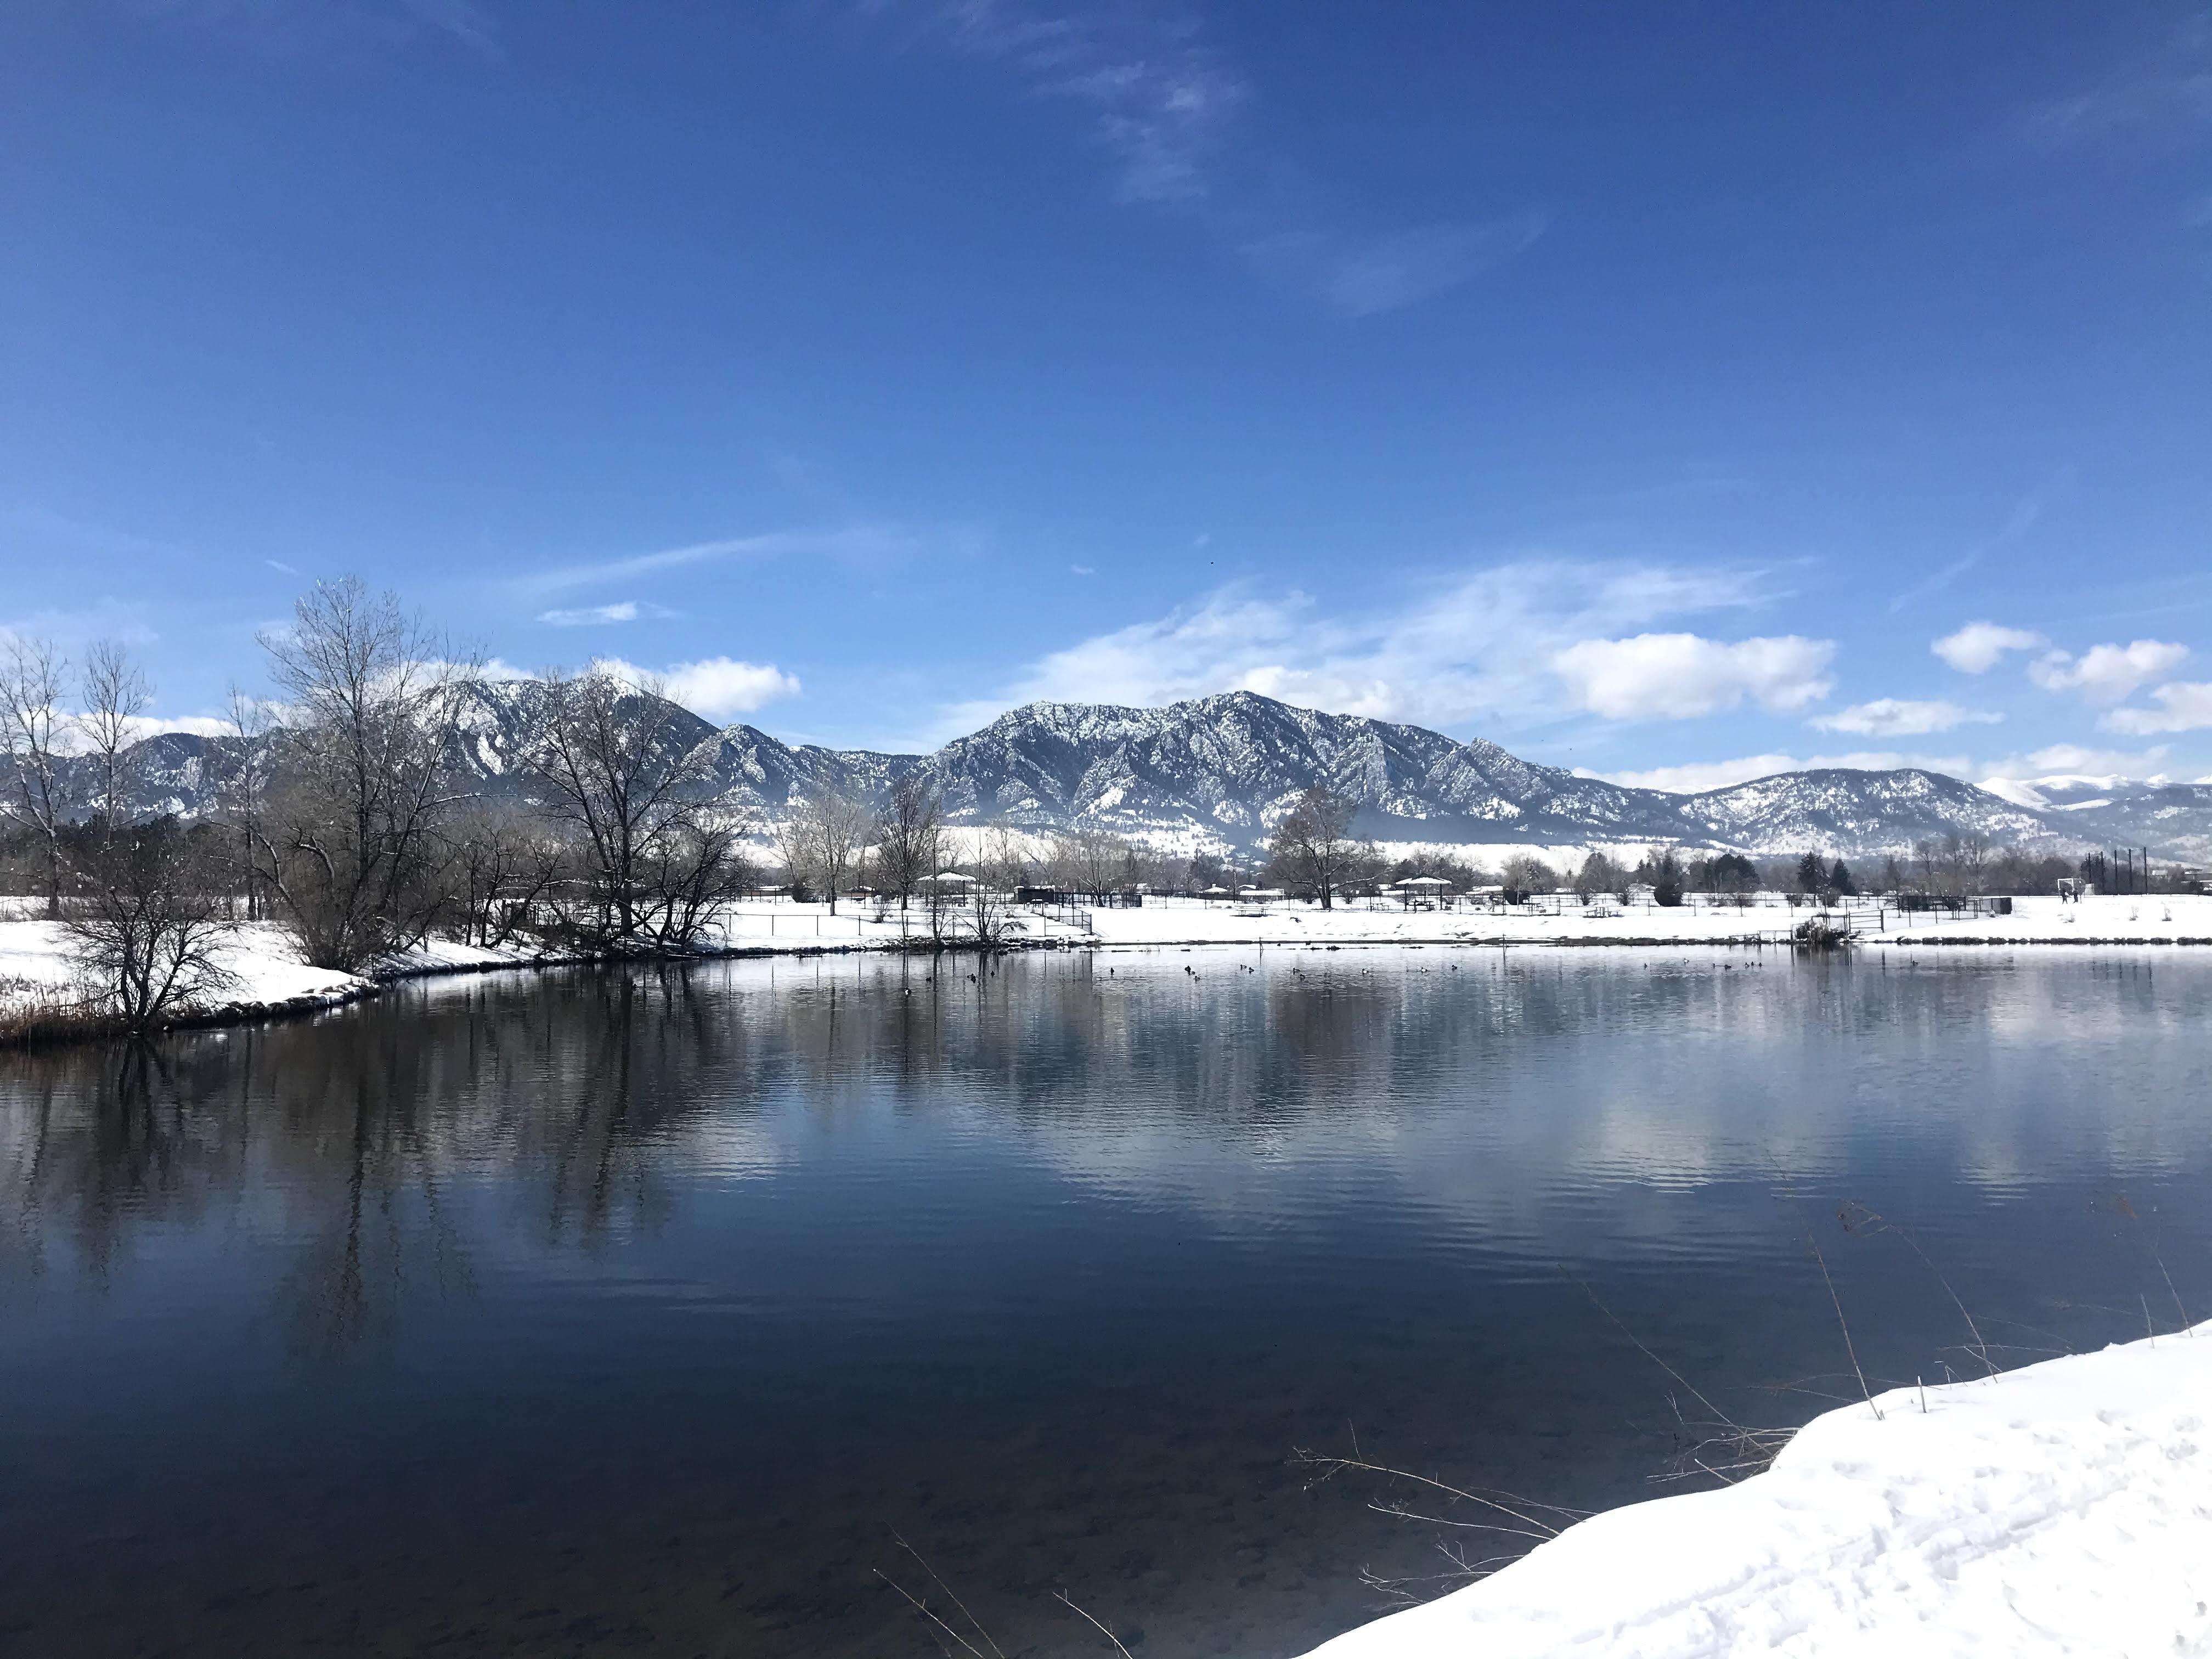 A scene from Boulder, Colorado (Photo courtesy of Emily Dalgleish)